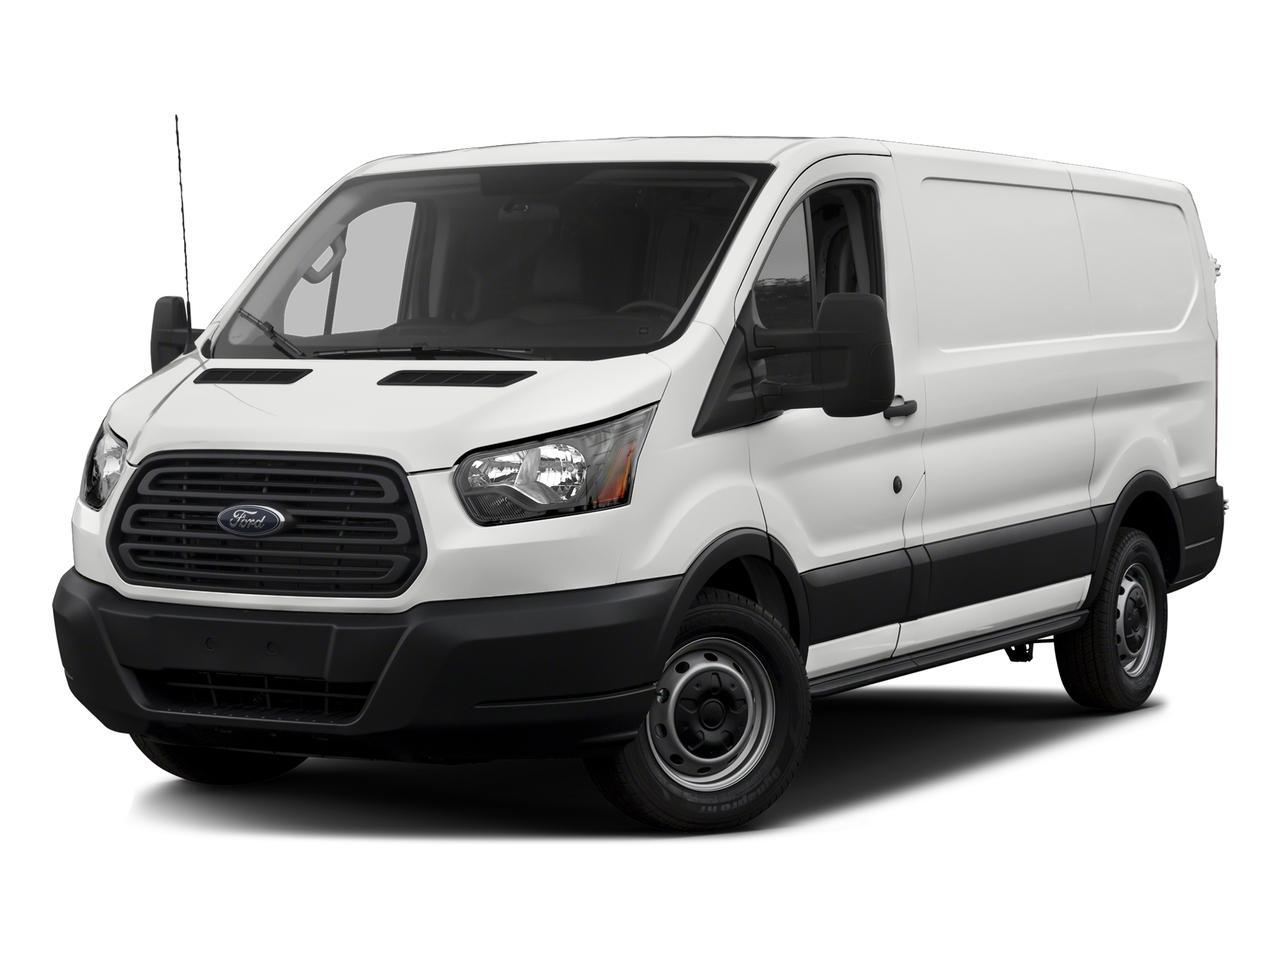 2016 Ford Transit Cargo Van Vehicle Photo in Oak Lawn, IL 60453